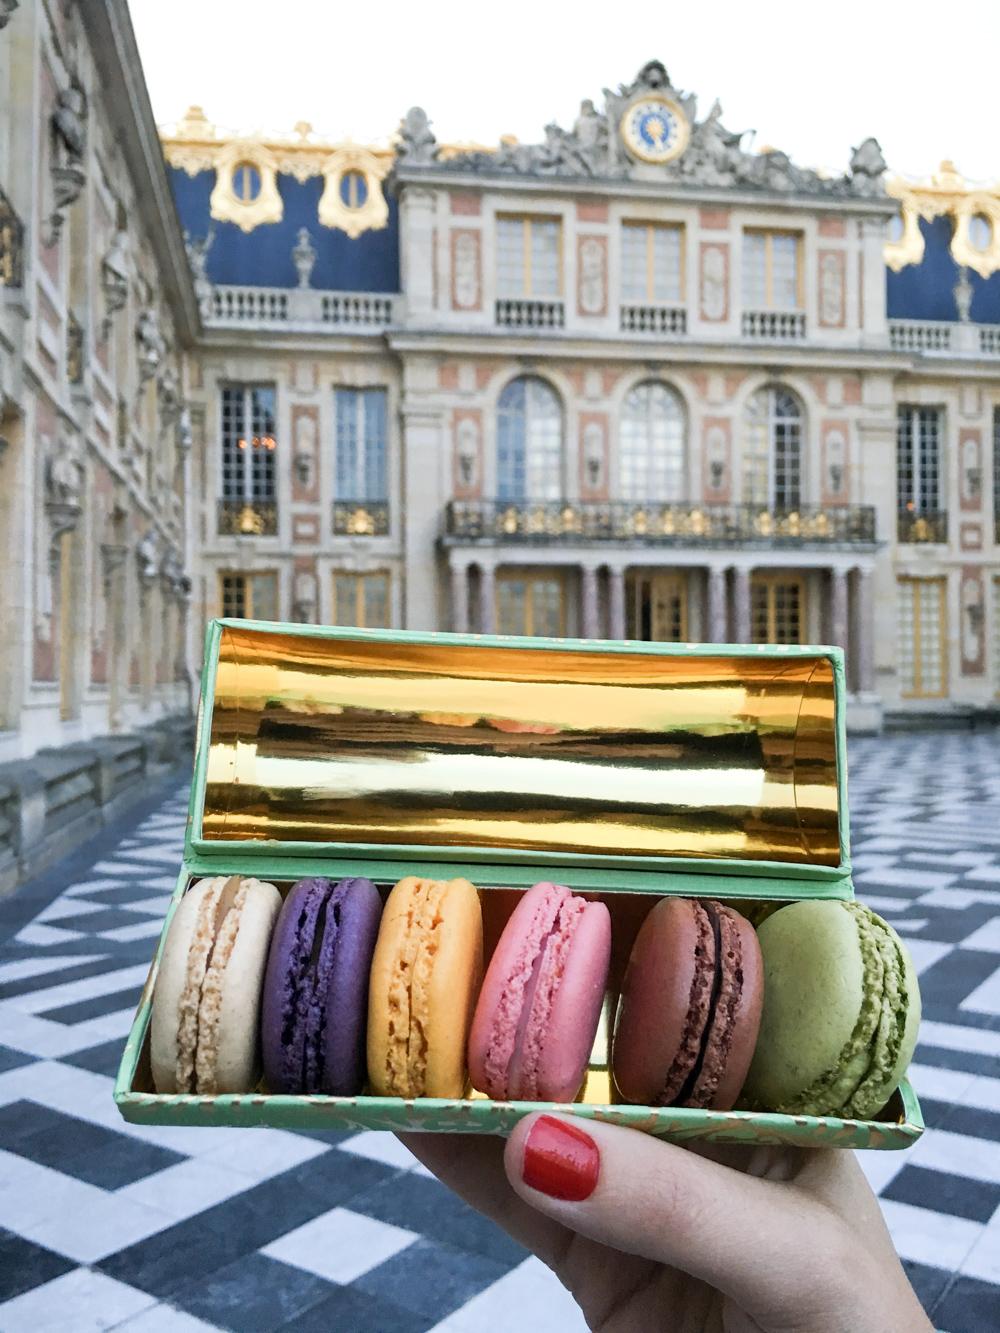 Palace of Versailles